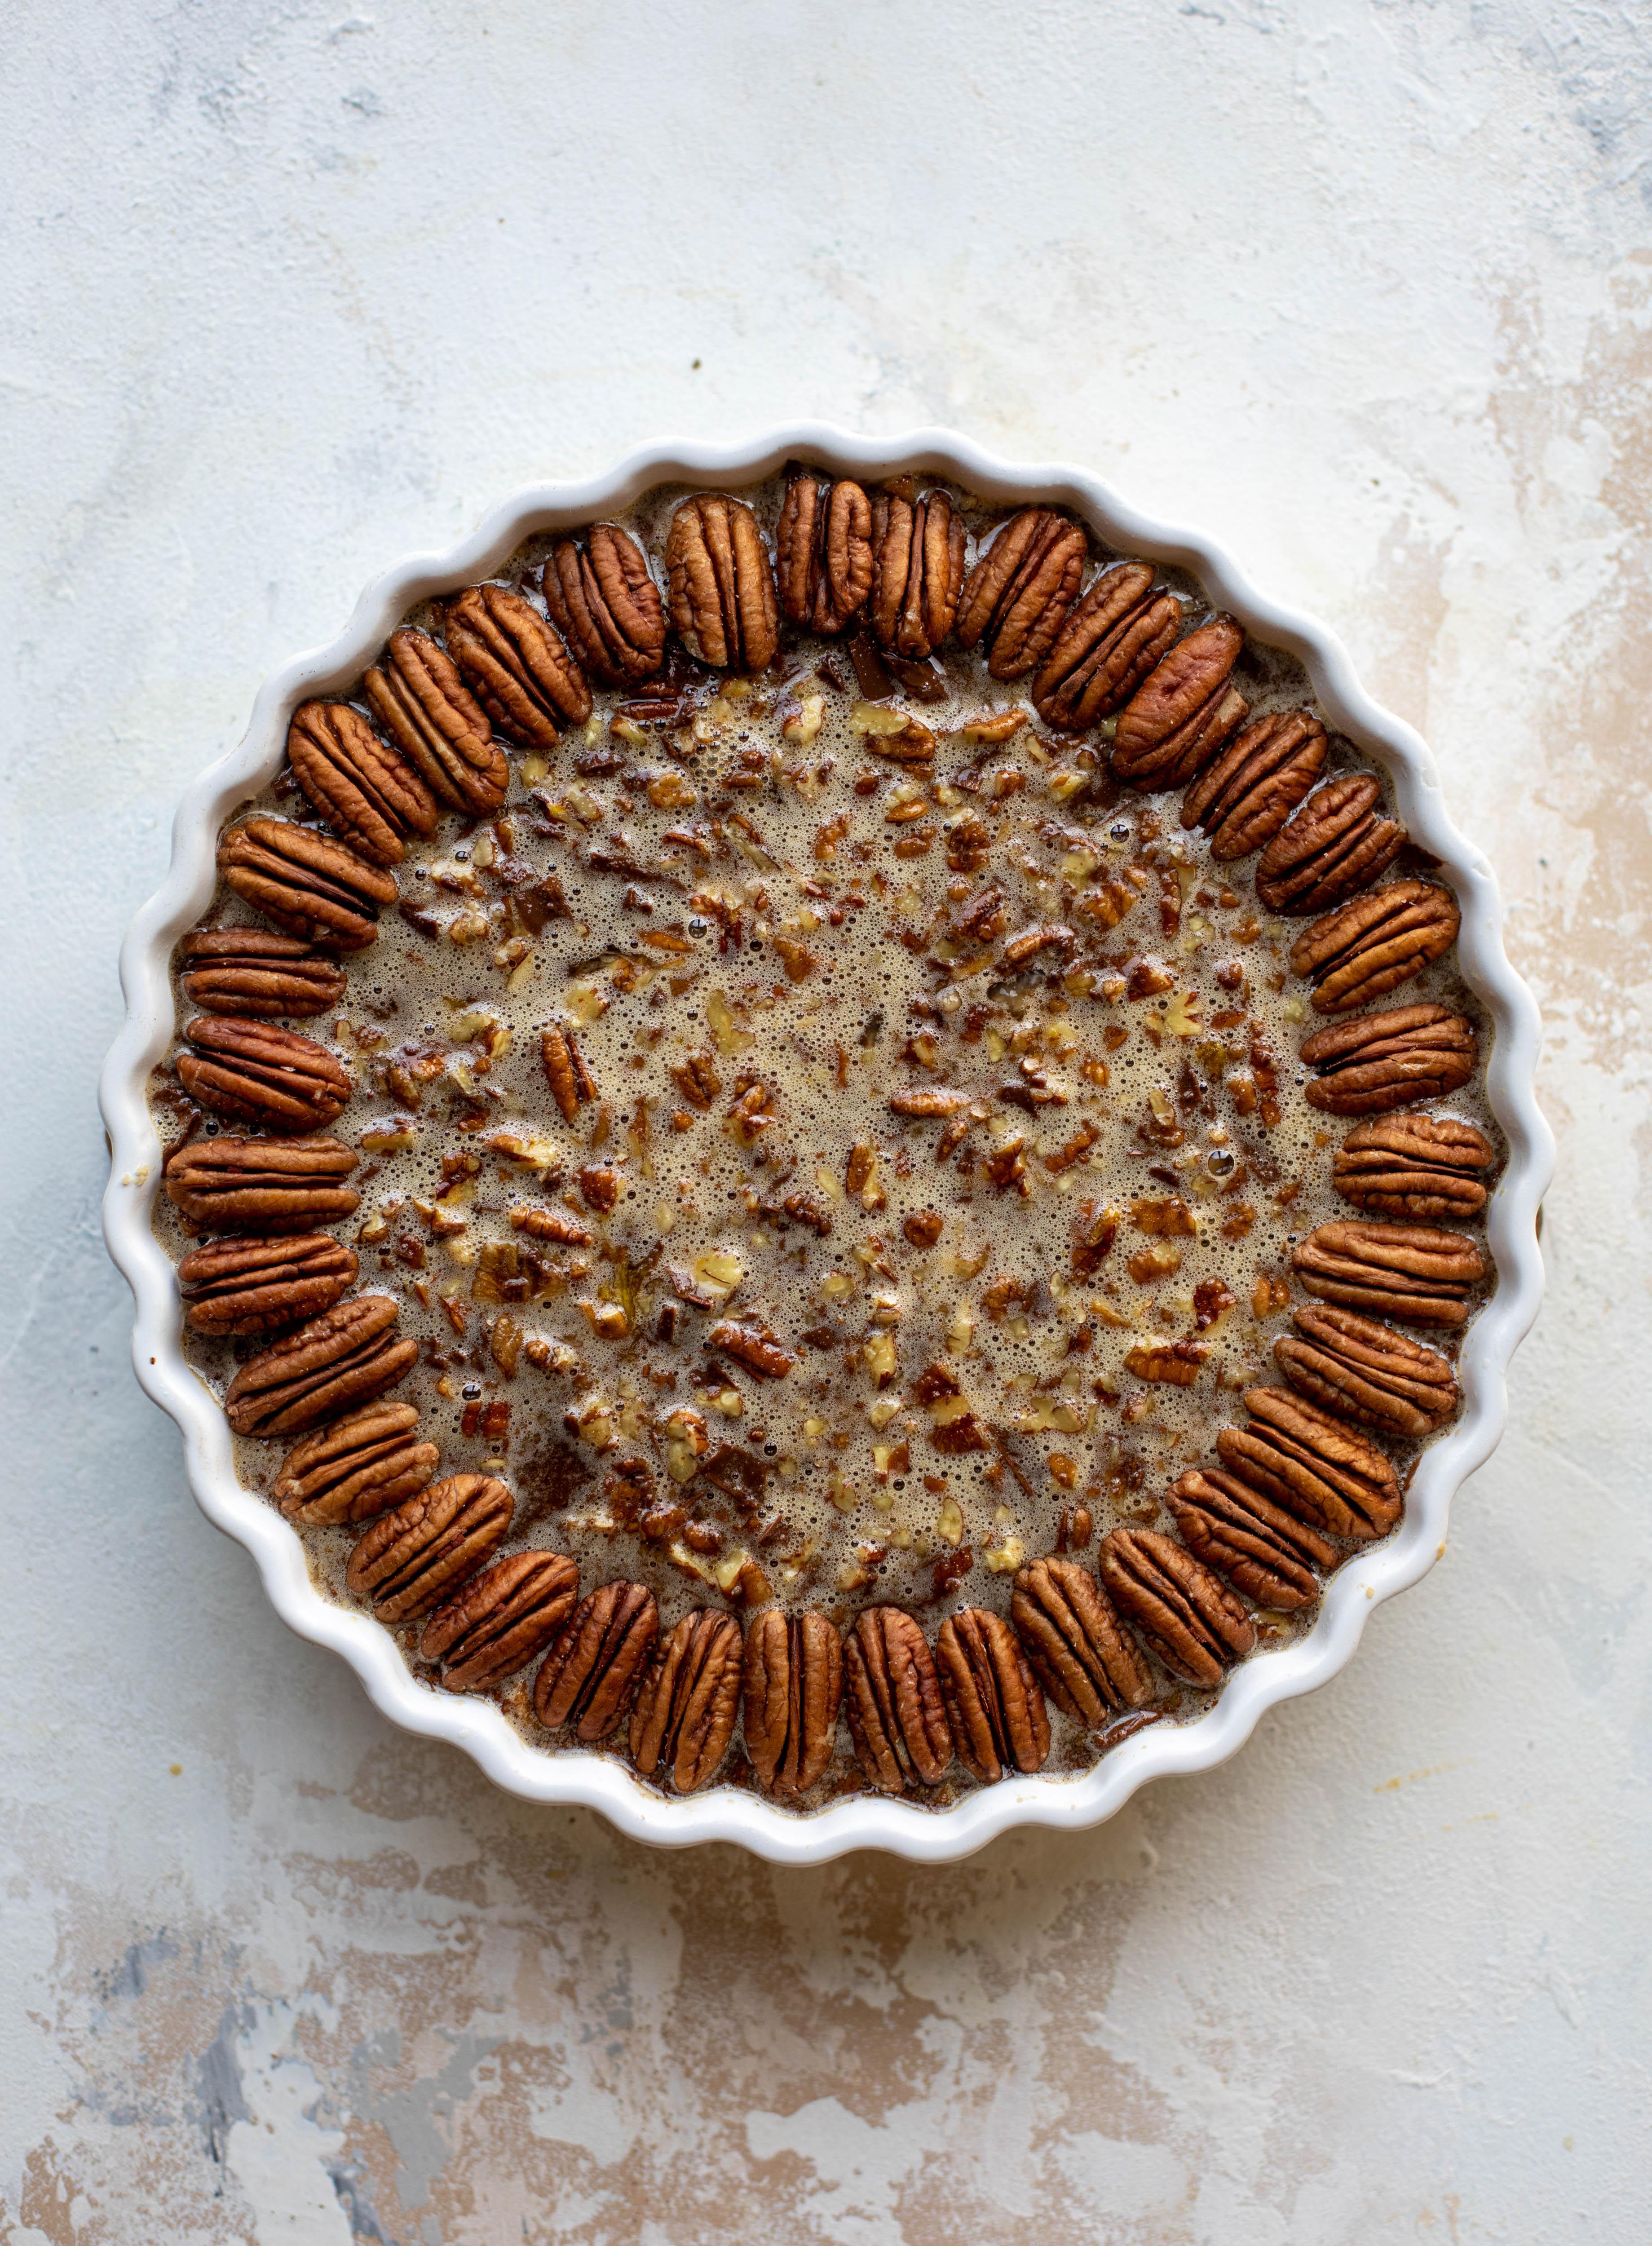 pecan tart prepped for the oven